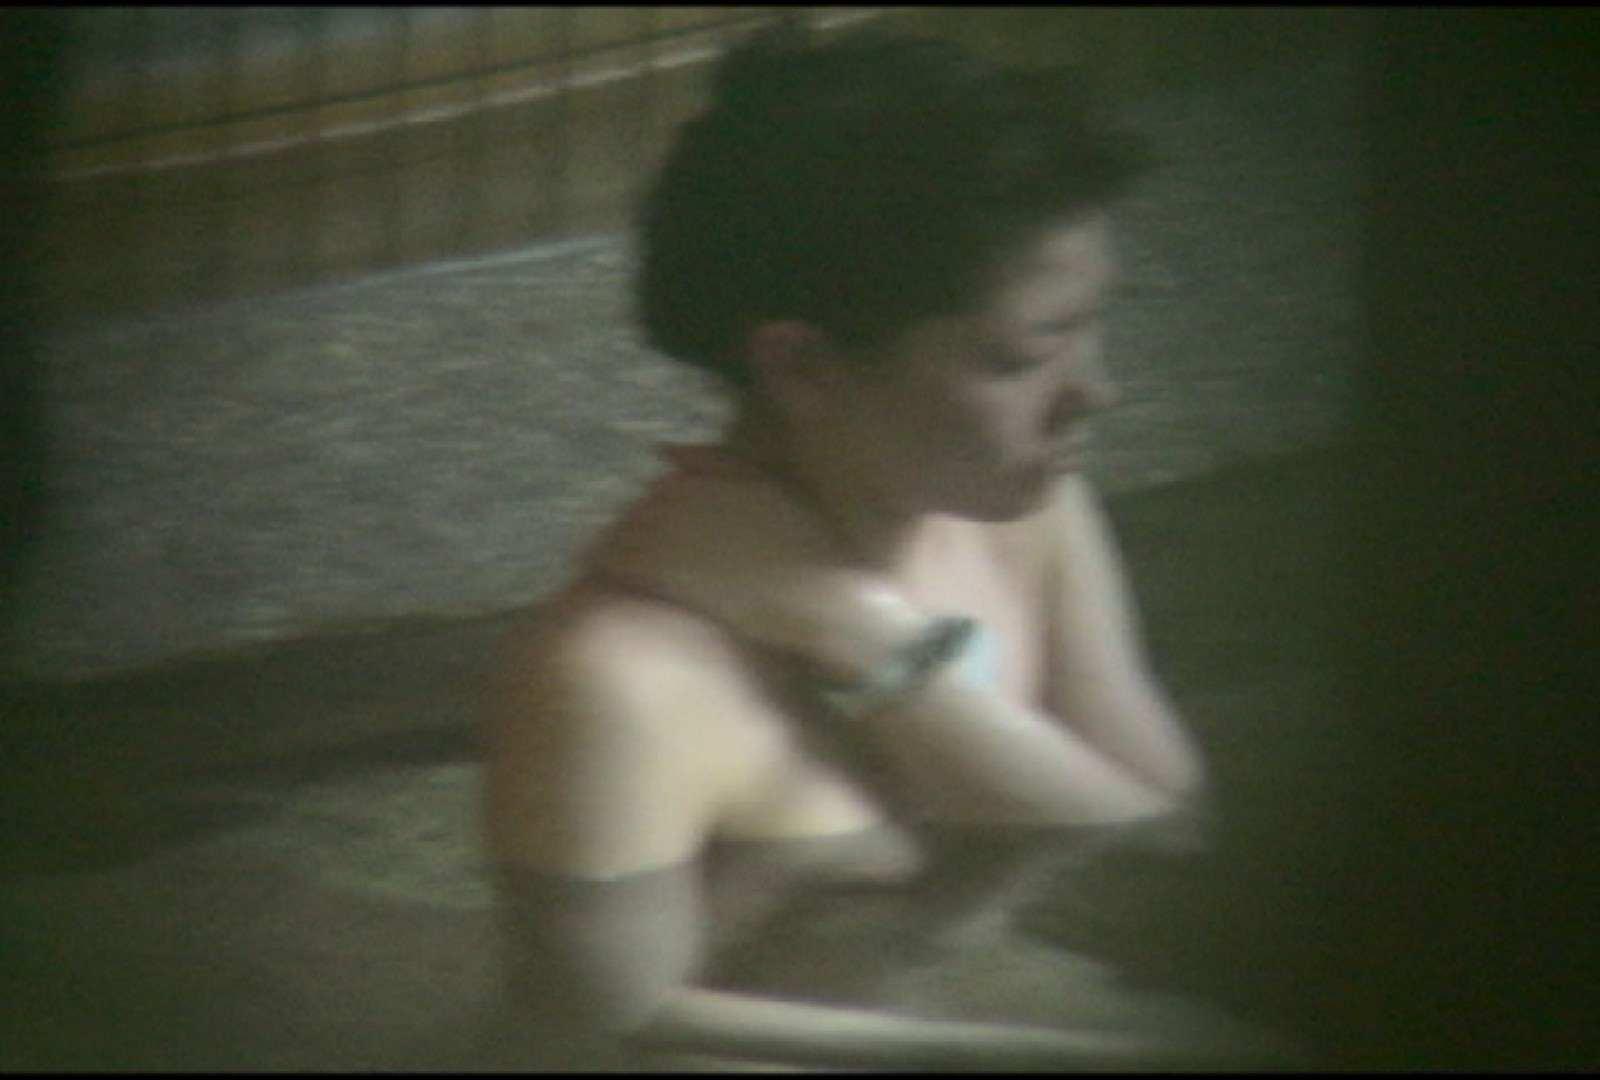 Aquaな露天風呂Vol.699 美しいOLの裸体 | 露天風呂突入  101pic 40